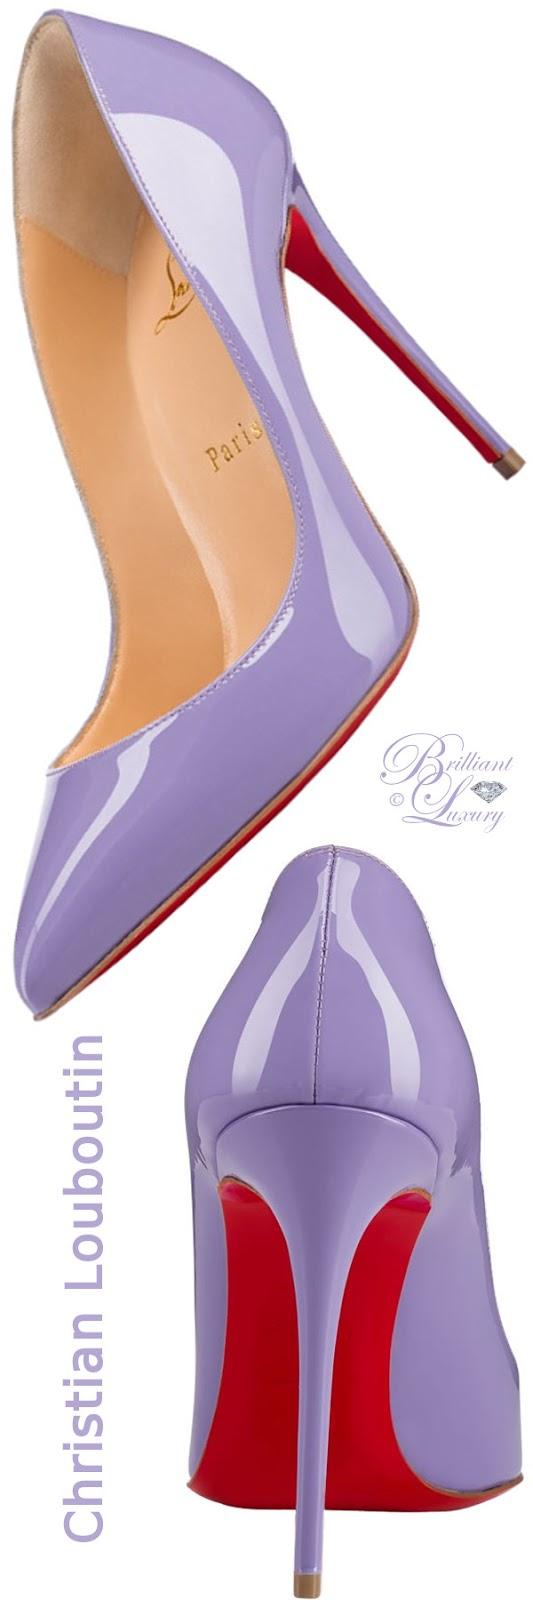 Brilliant Luxury ♦ Christian Louboutin Pigalle Follies superfine stiletto heels in hortensia